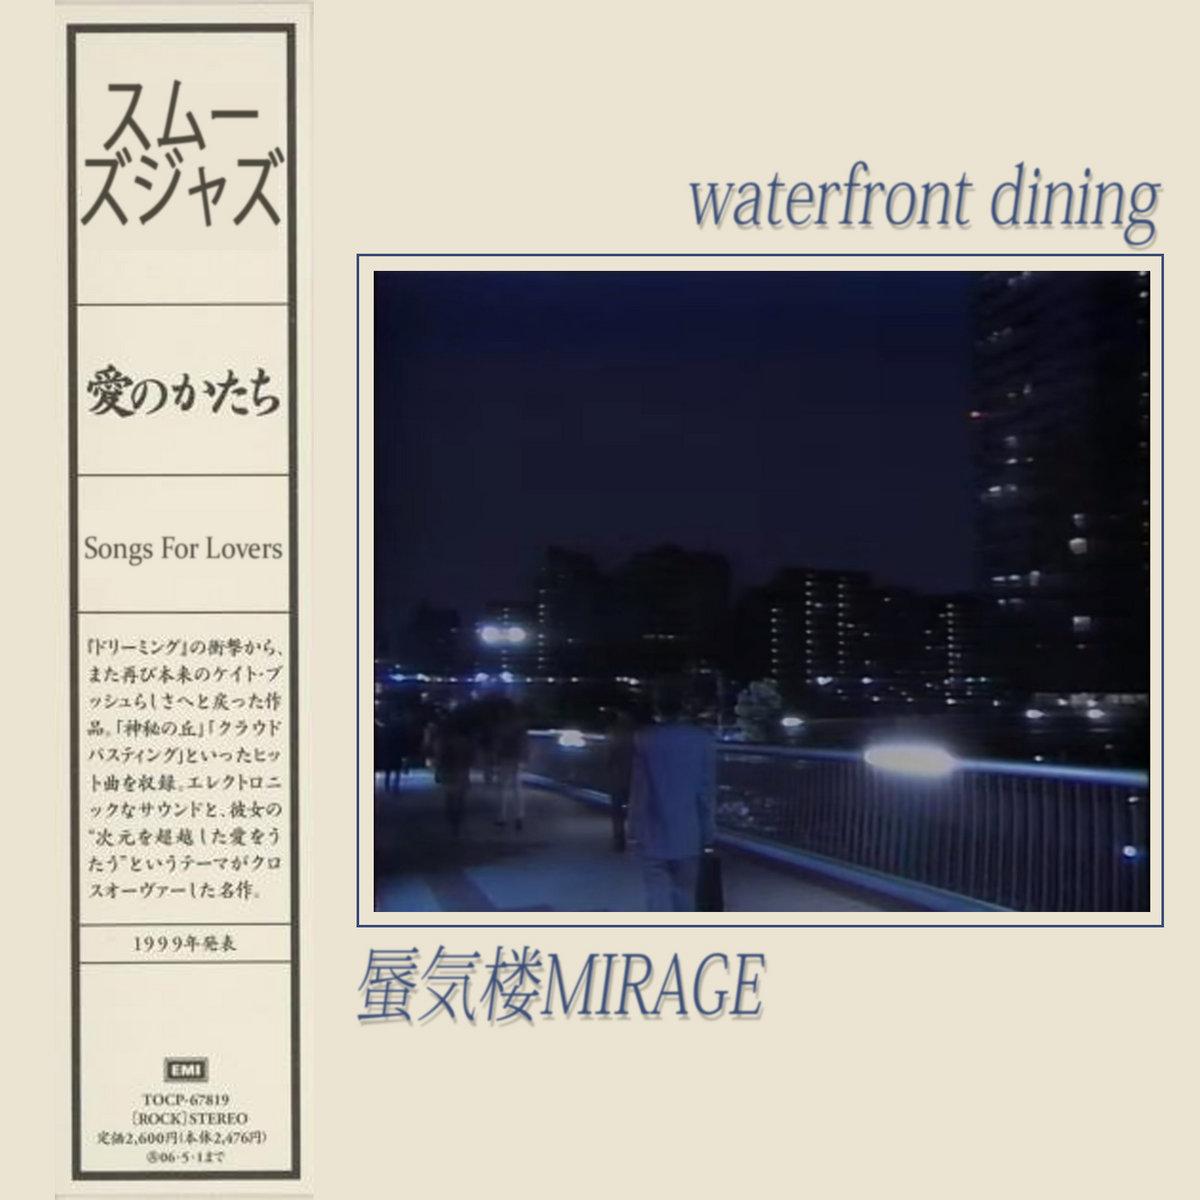 By 蜃気楼MIRAGE U0026 Waterfront Dining